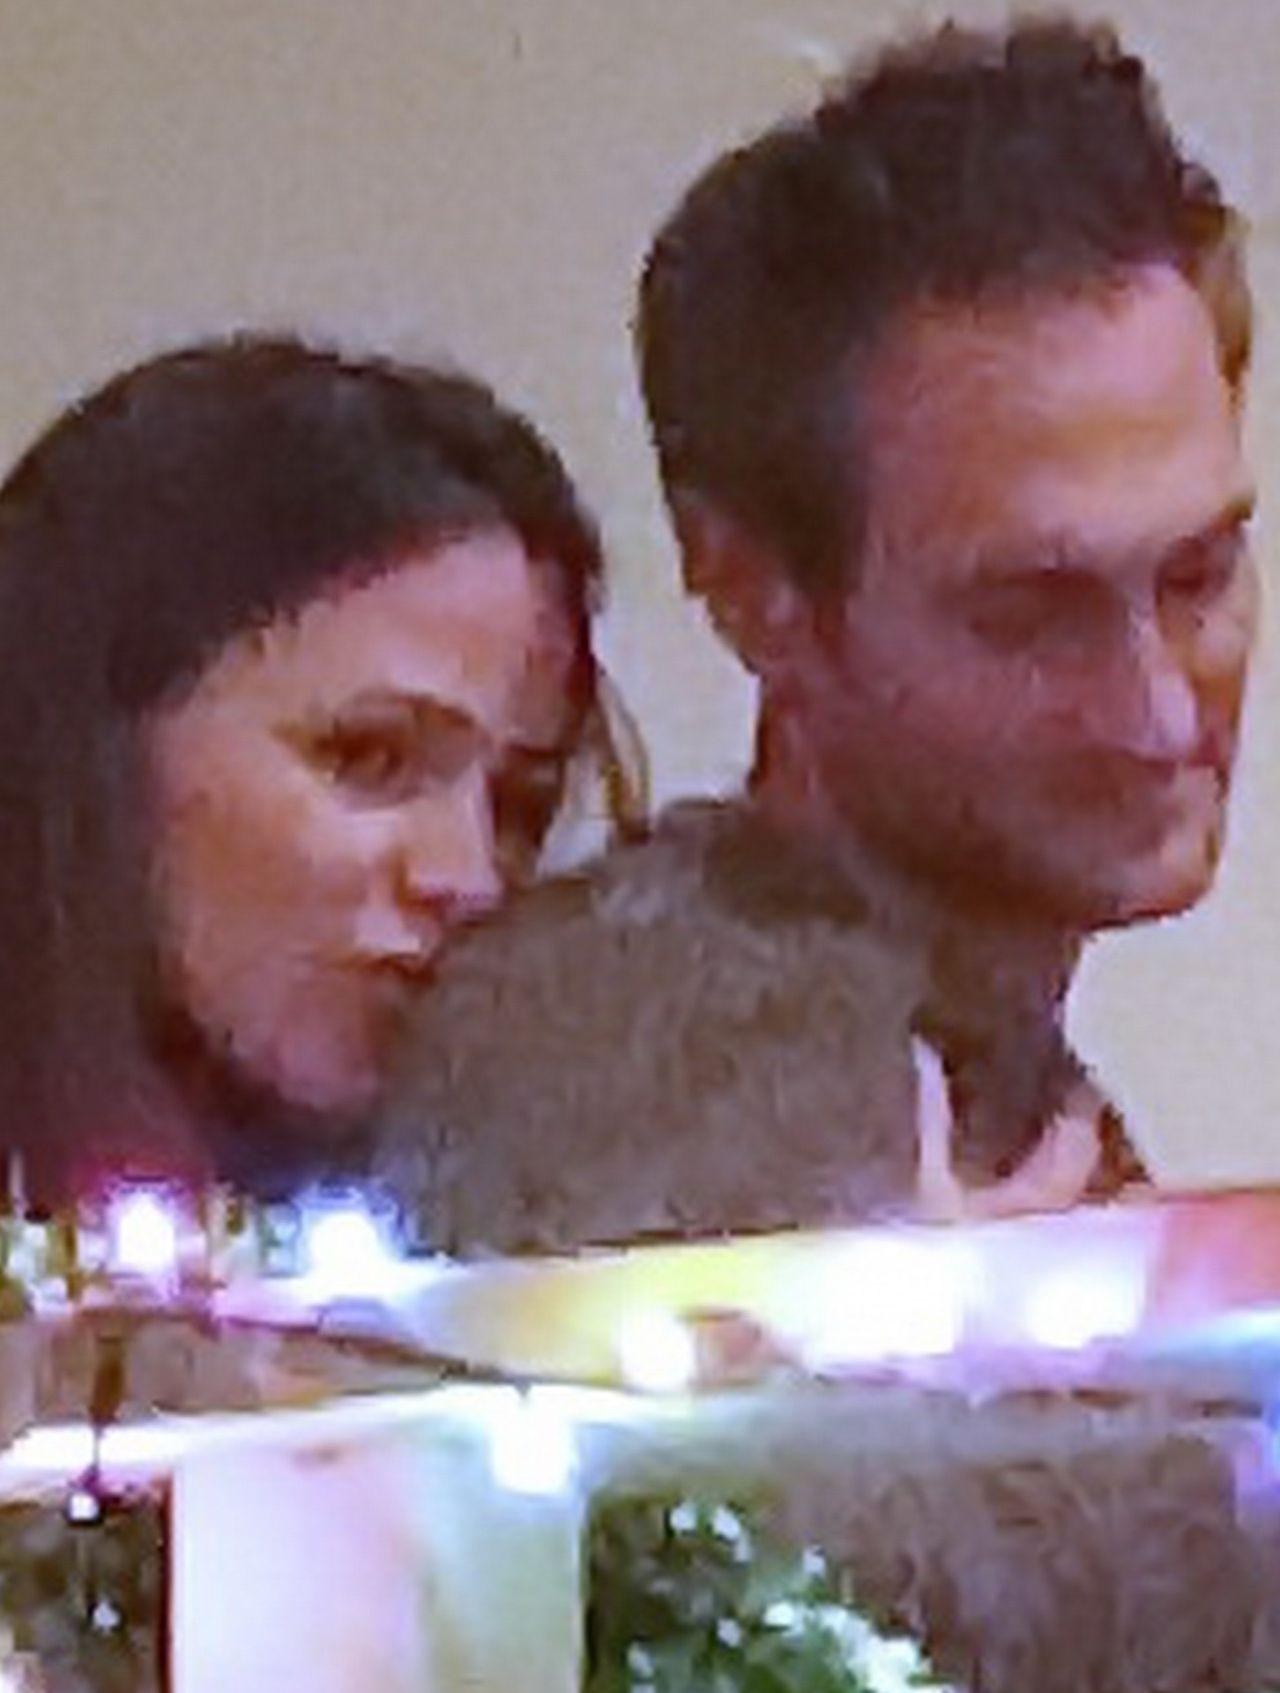 ZAKOCHANA Jennifer Garner z nowym partnerem, Johnem Millerem (EXCLUSIVE)